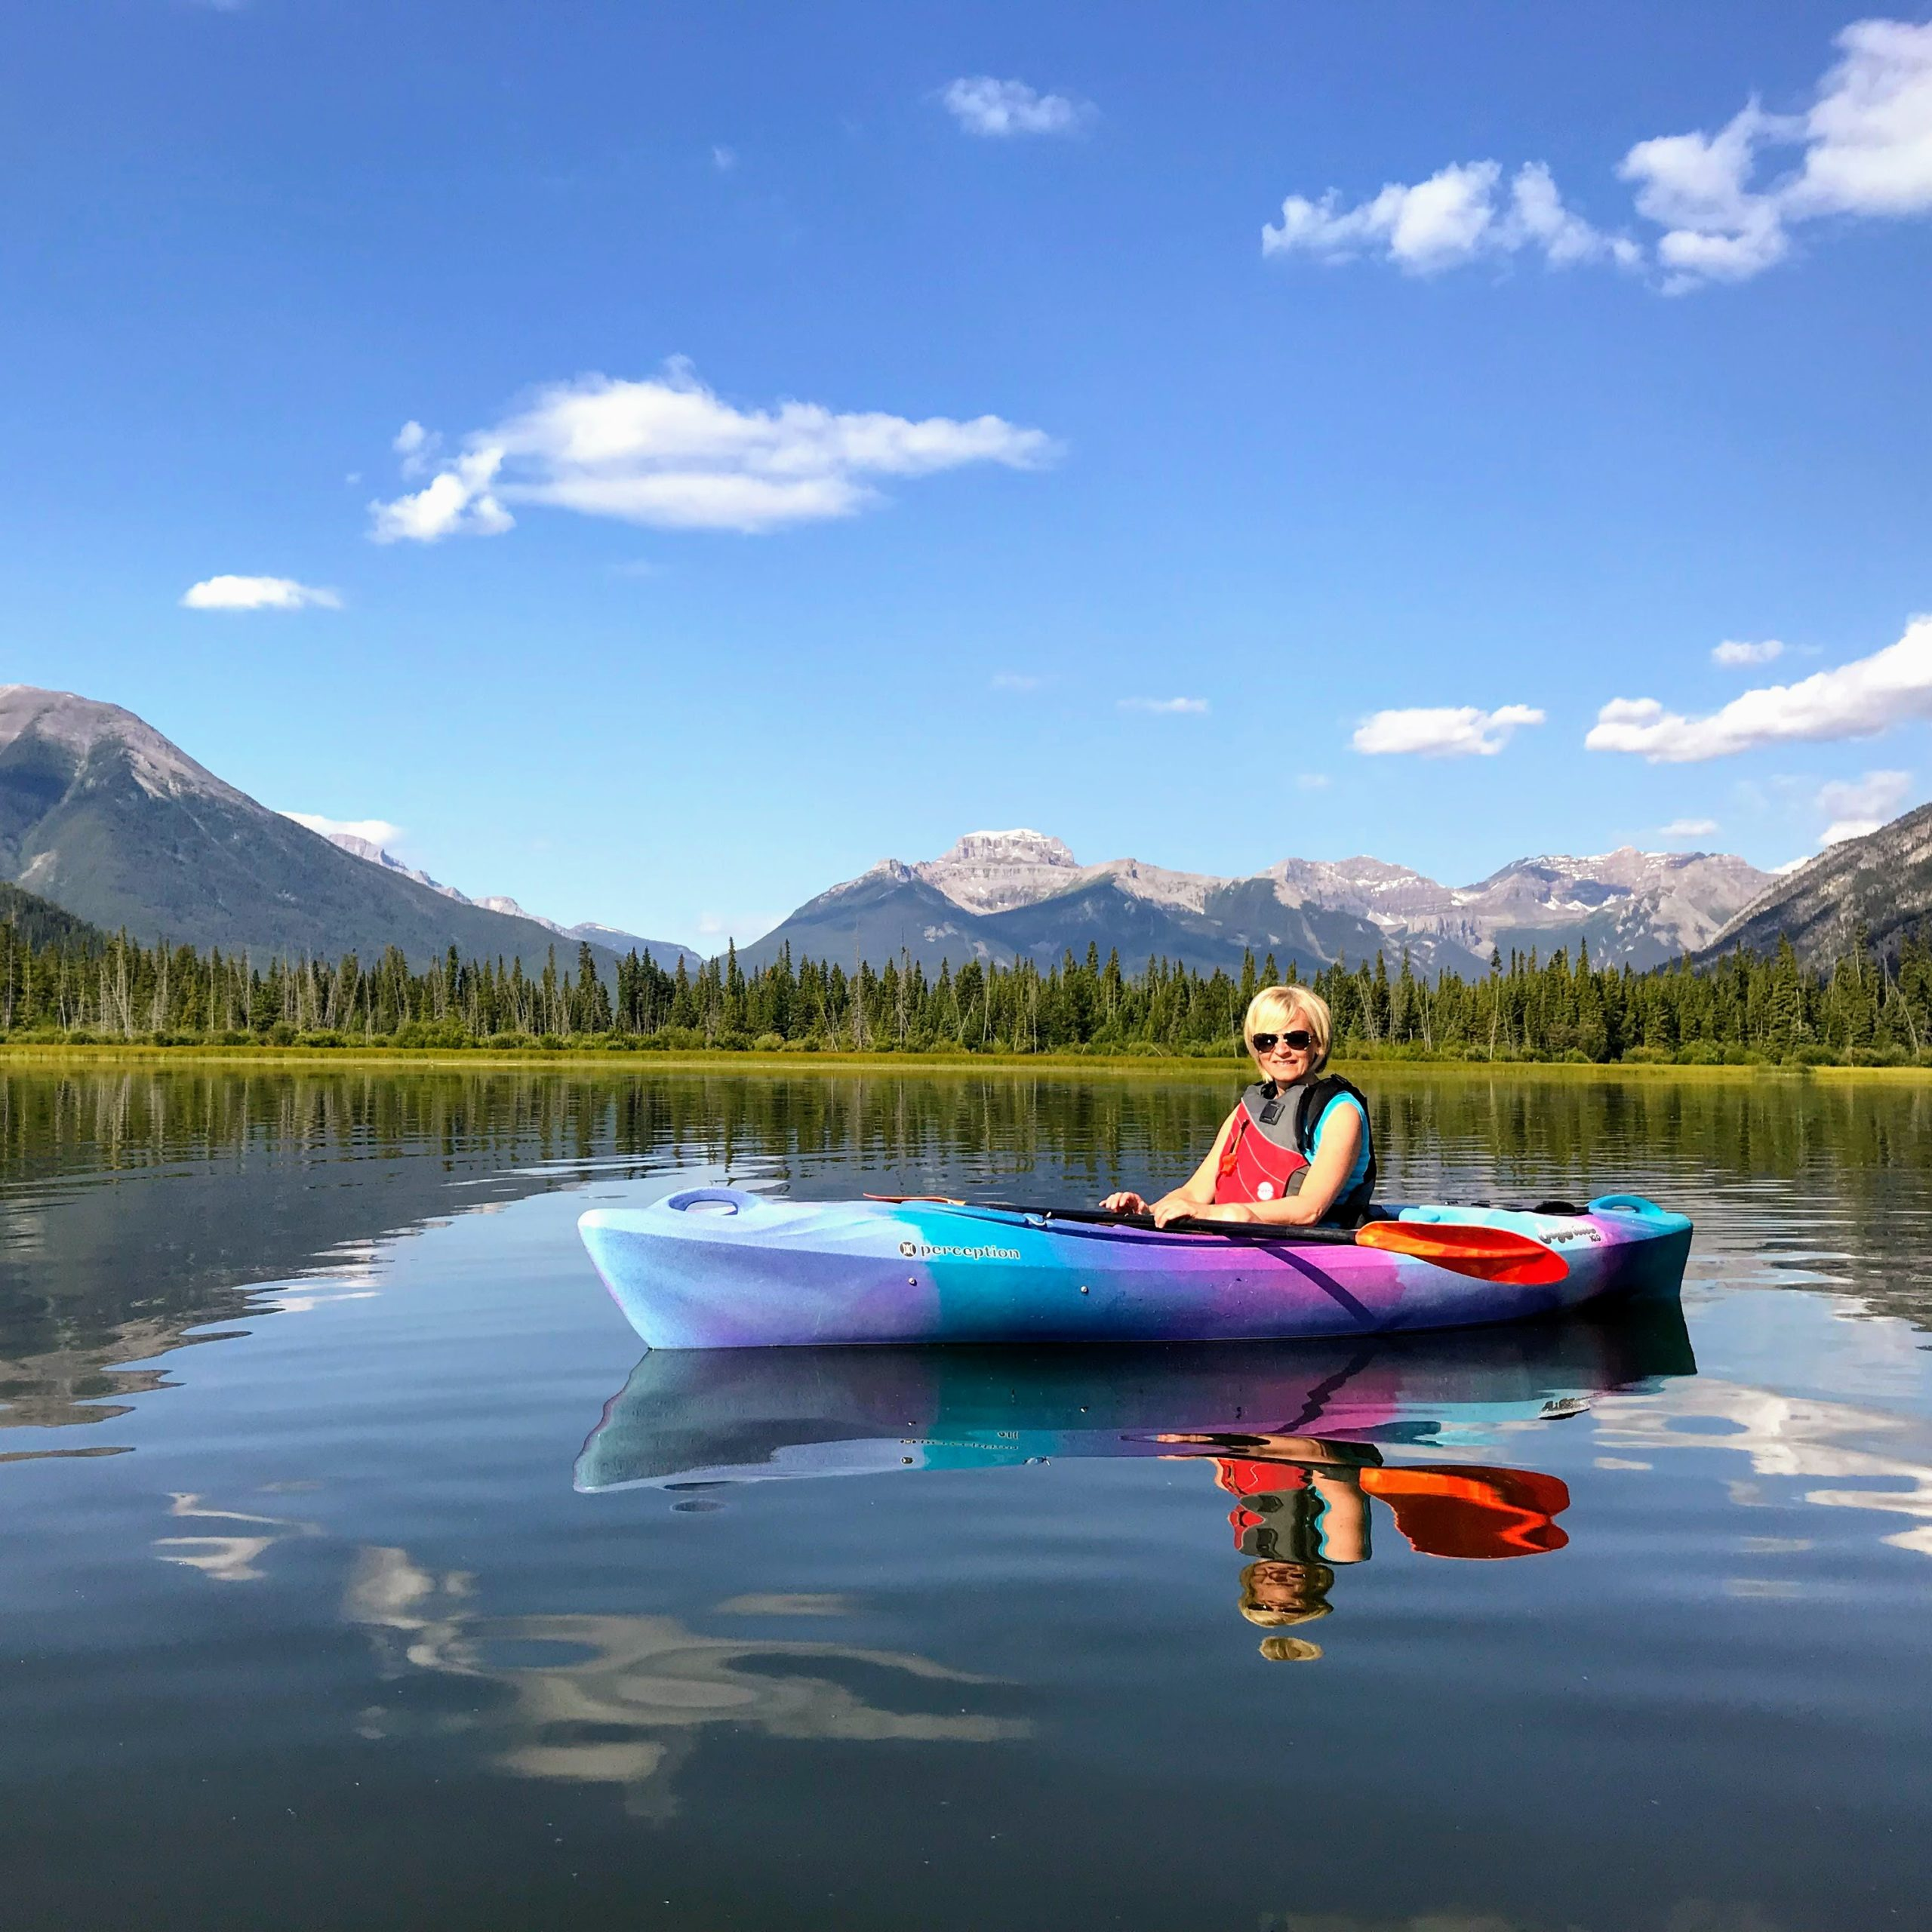 Vermilion Lakes in Banff